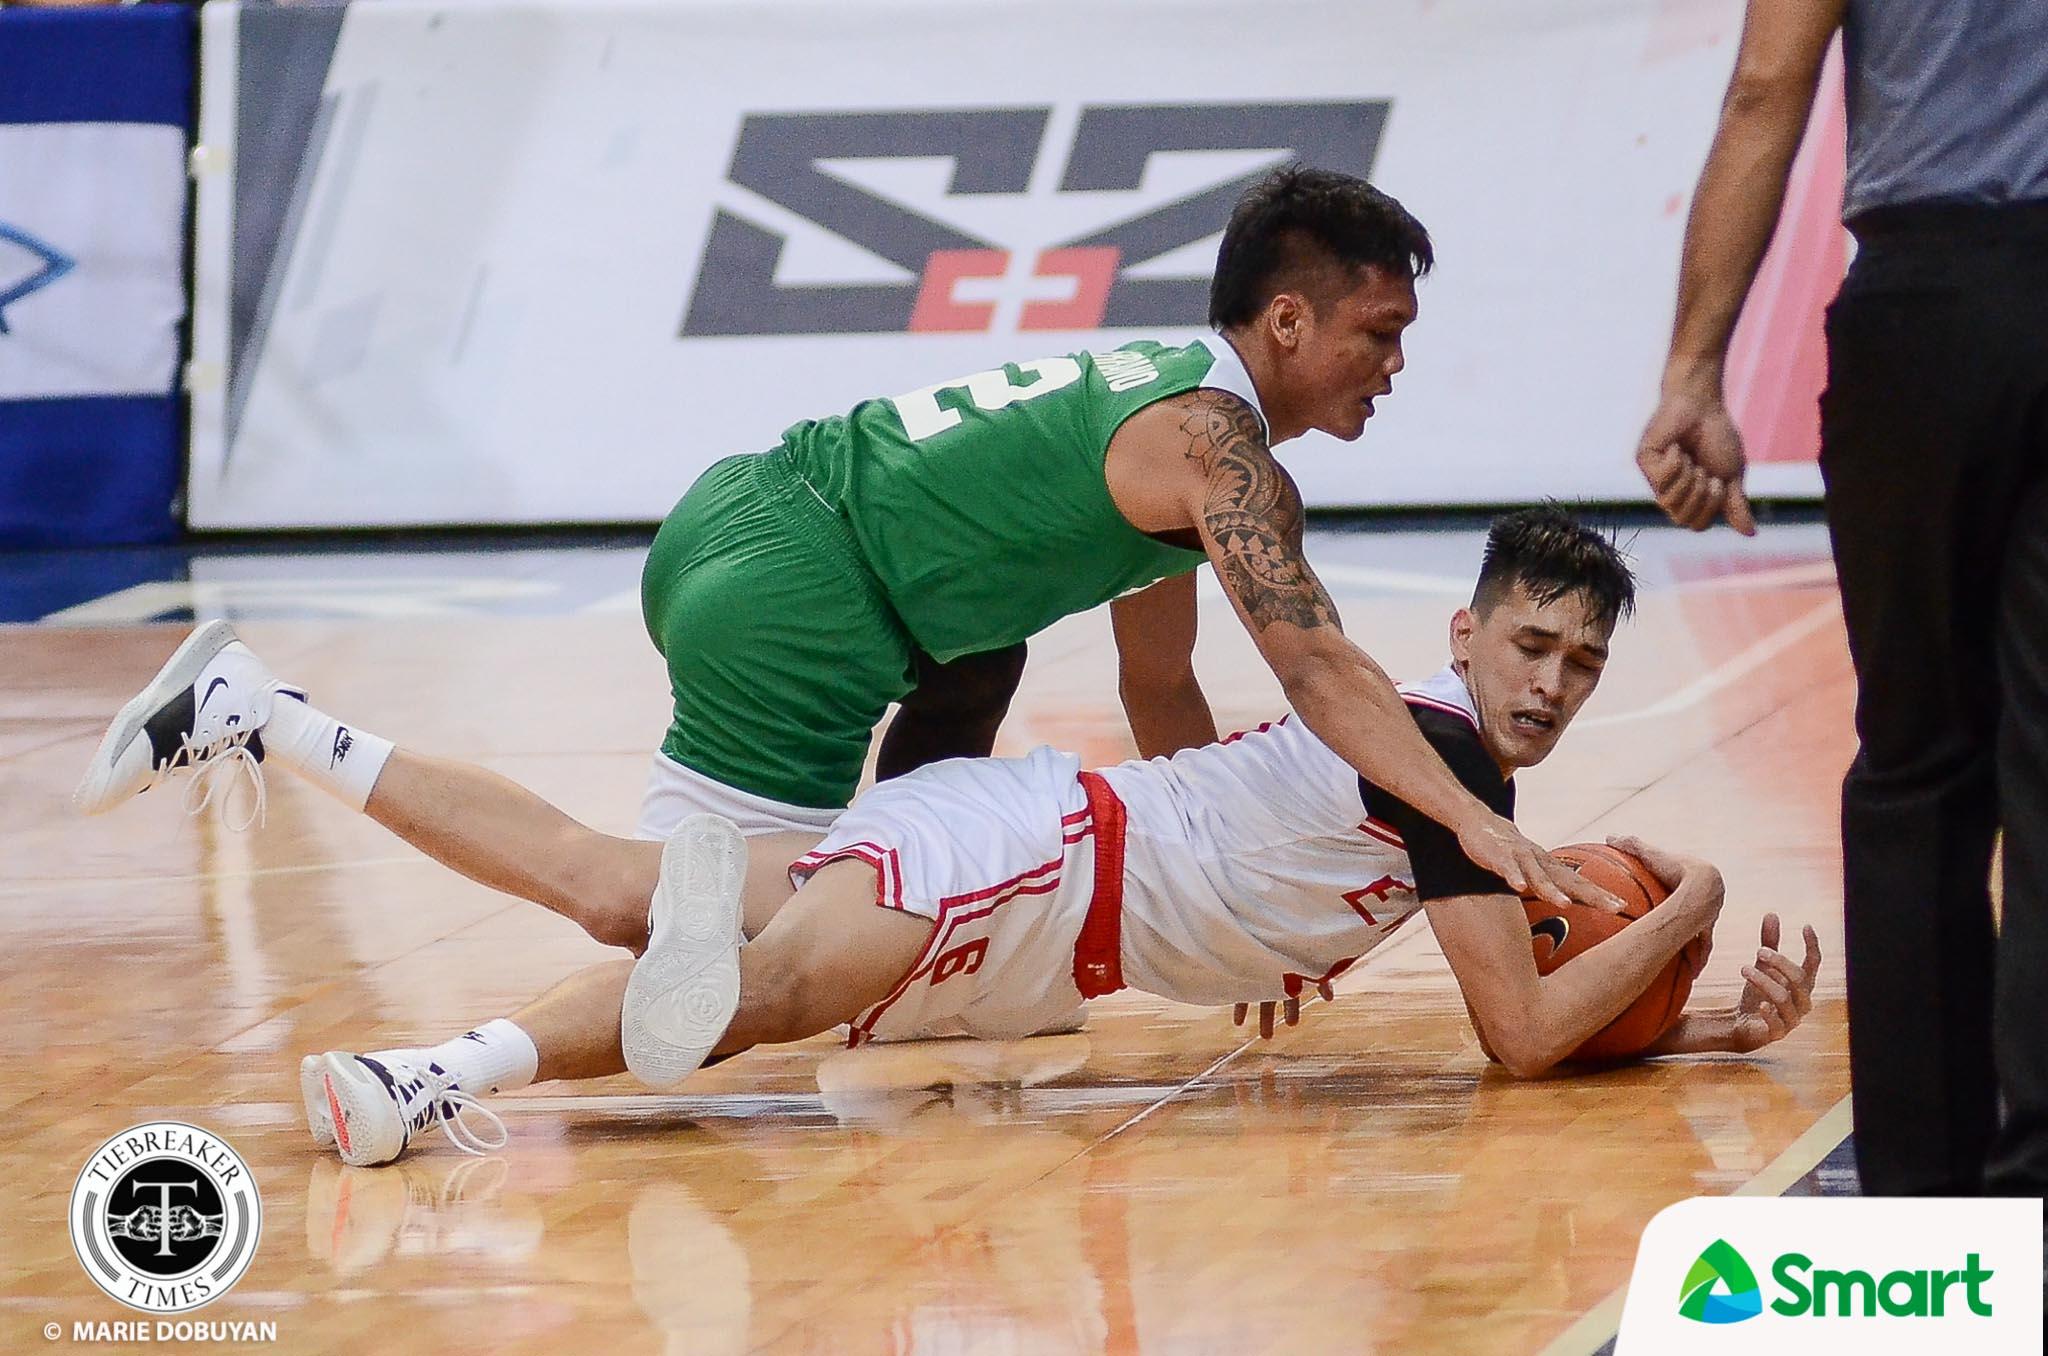 Tiebreaker Times Neil Tolentino basks in revenge game over La Salle Basketball News UAAP UE  UE Men's Basketball UAAP Season 82 Men's Basketball UAAP Season 82 Neil Tolentino